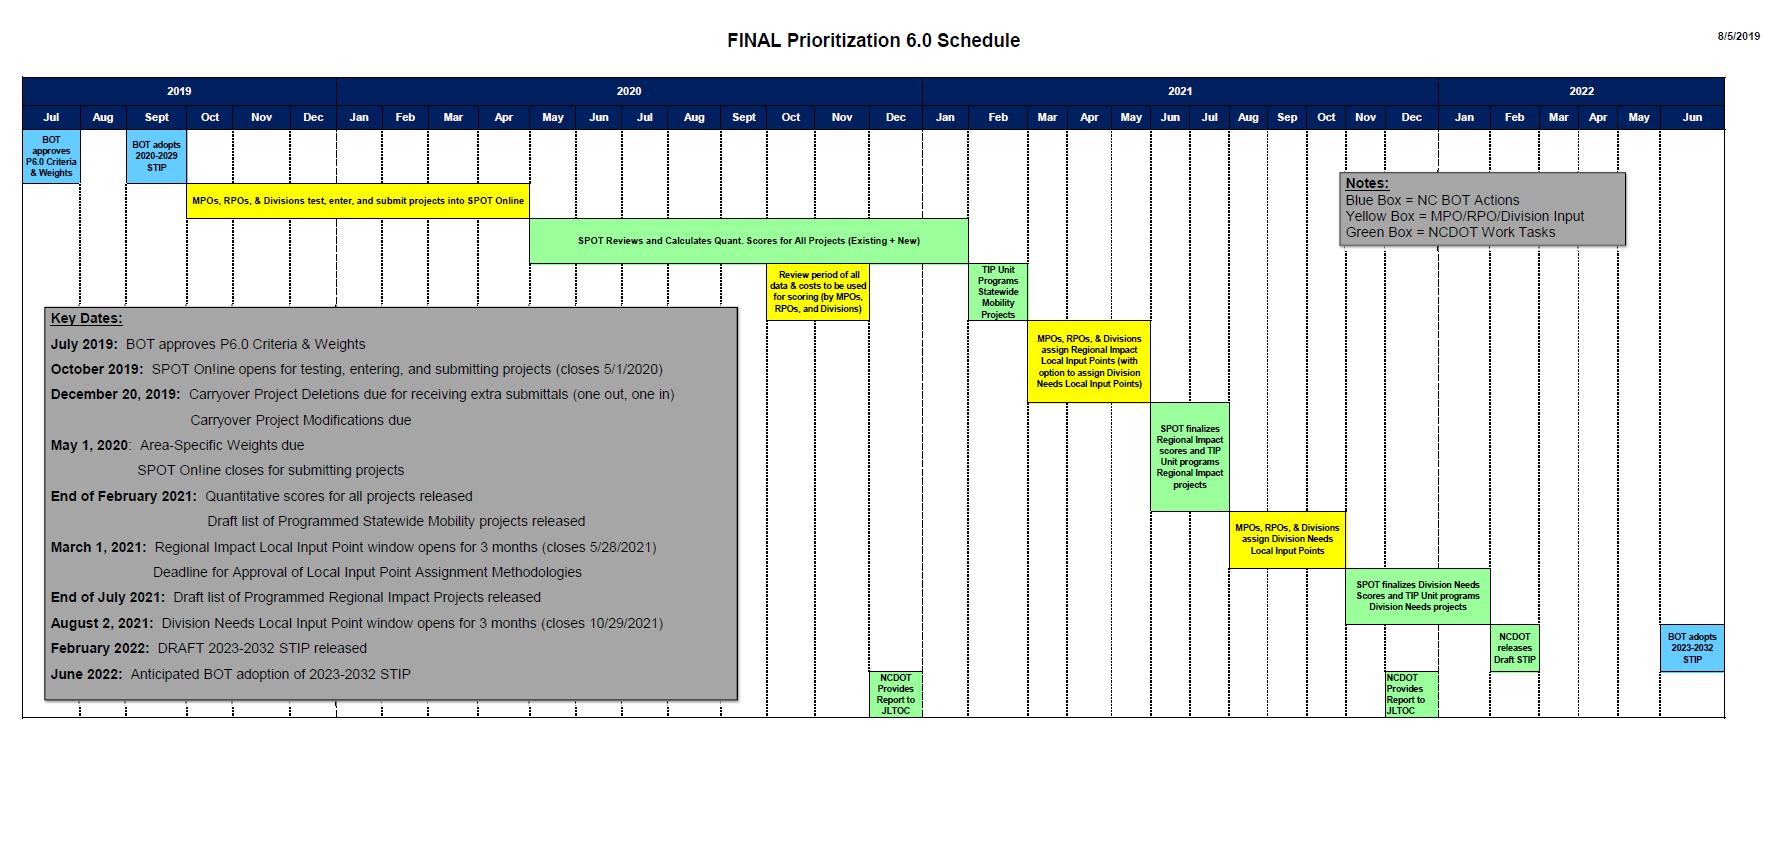 SPOT 6.0 Schedule - Updated Aug. 2019